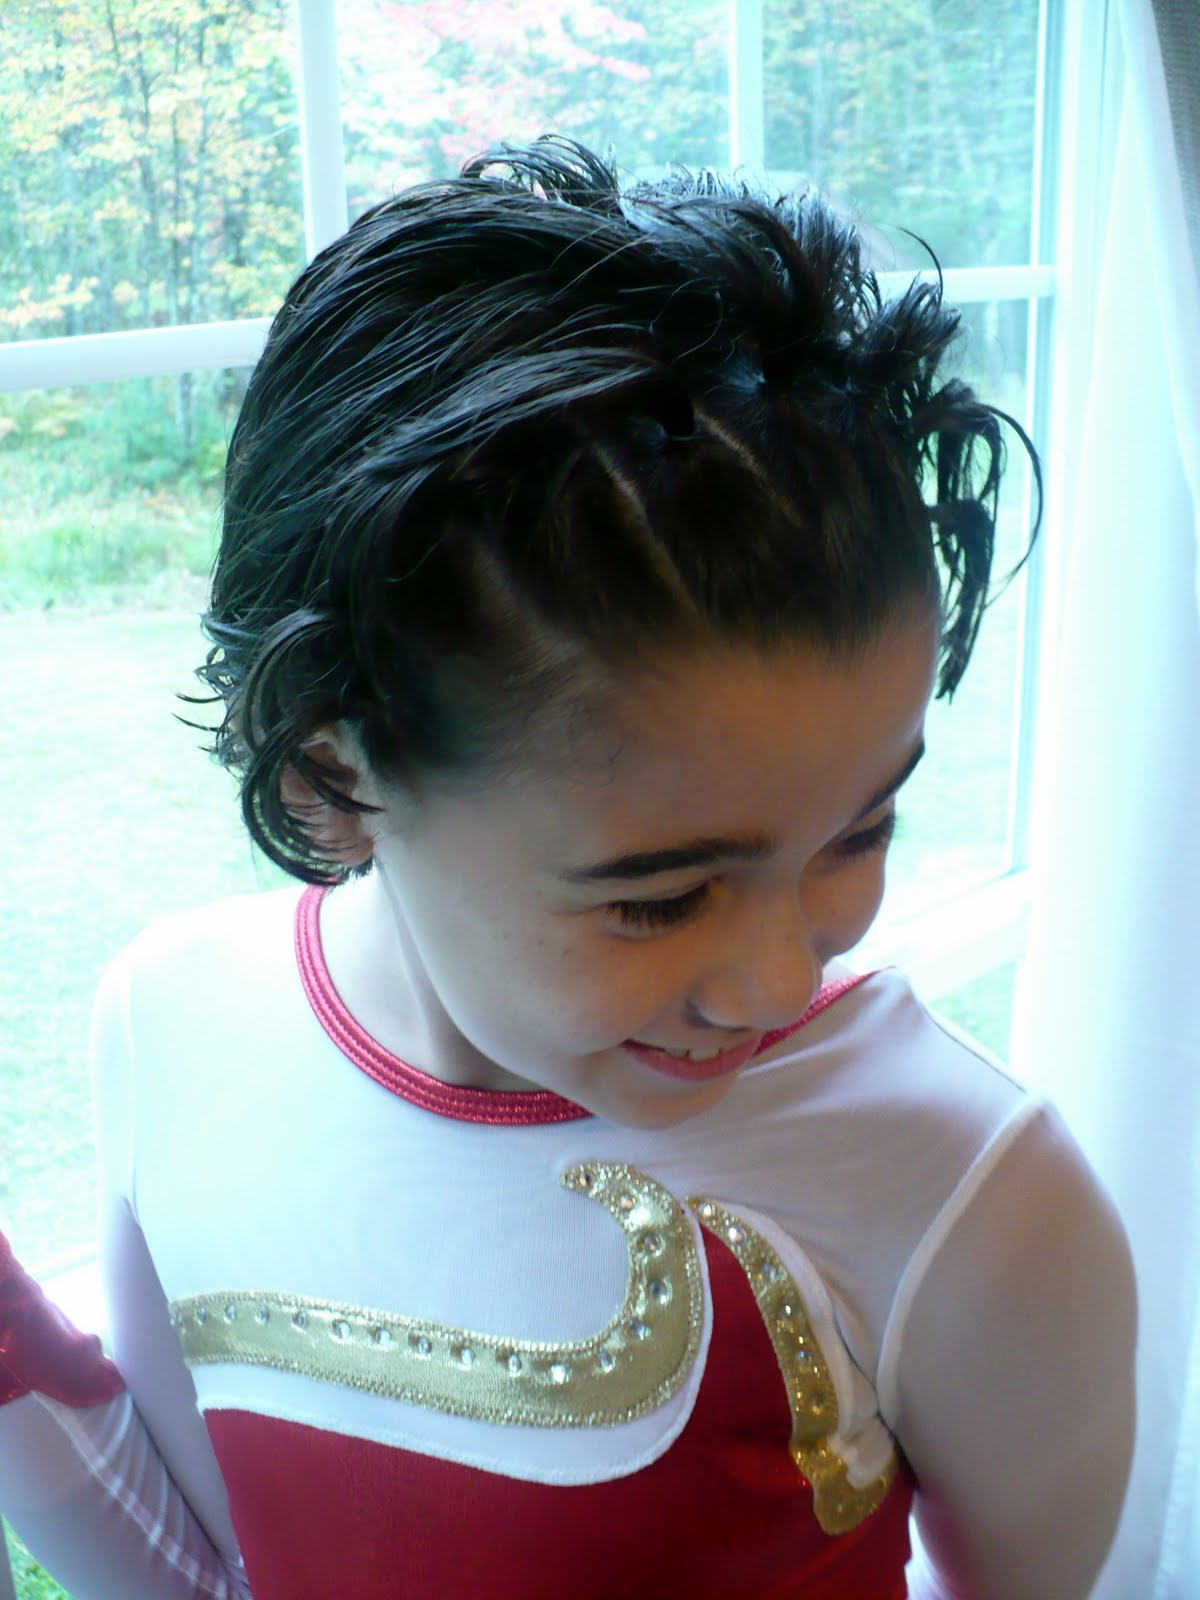 Astonishing Short Hair For Gymnastics Short Hair Fashions Short Hairstyles For Black Women Fulllsitofus